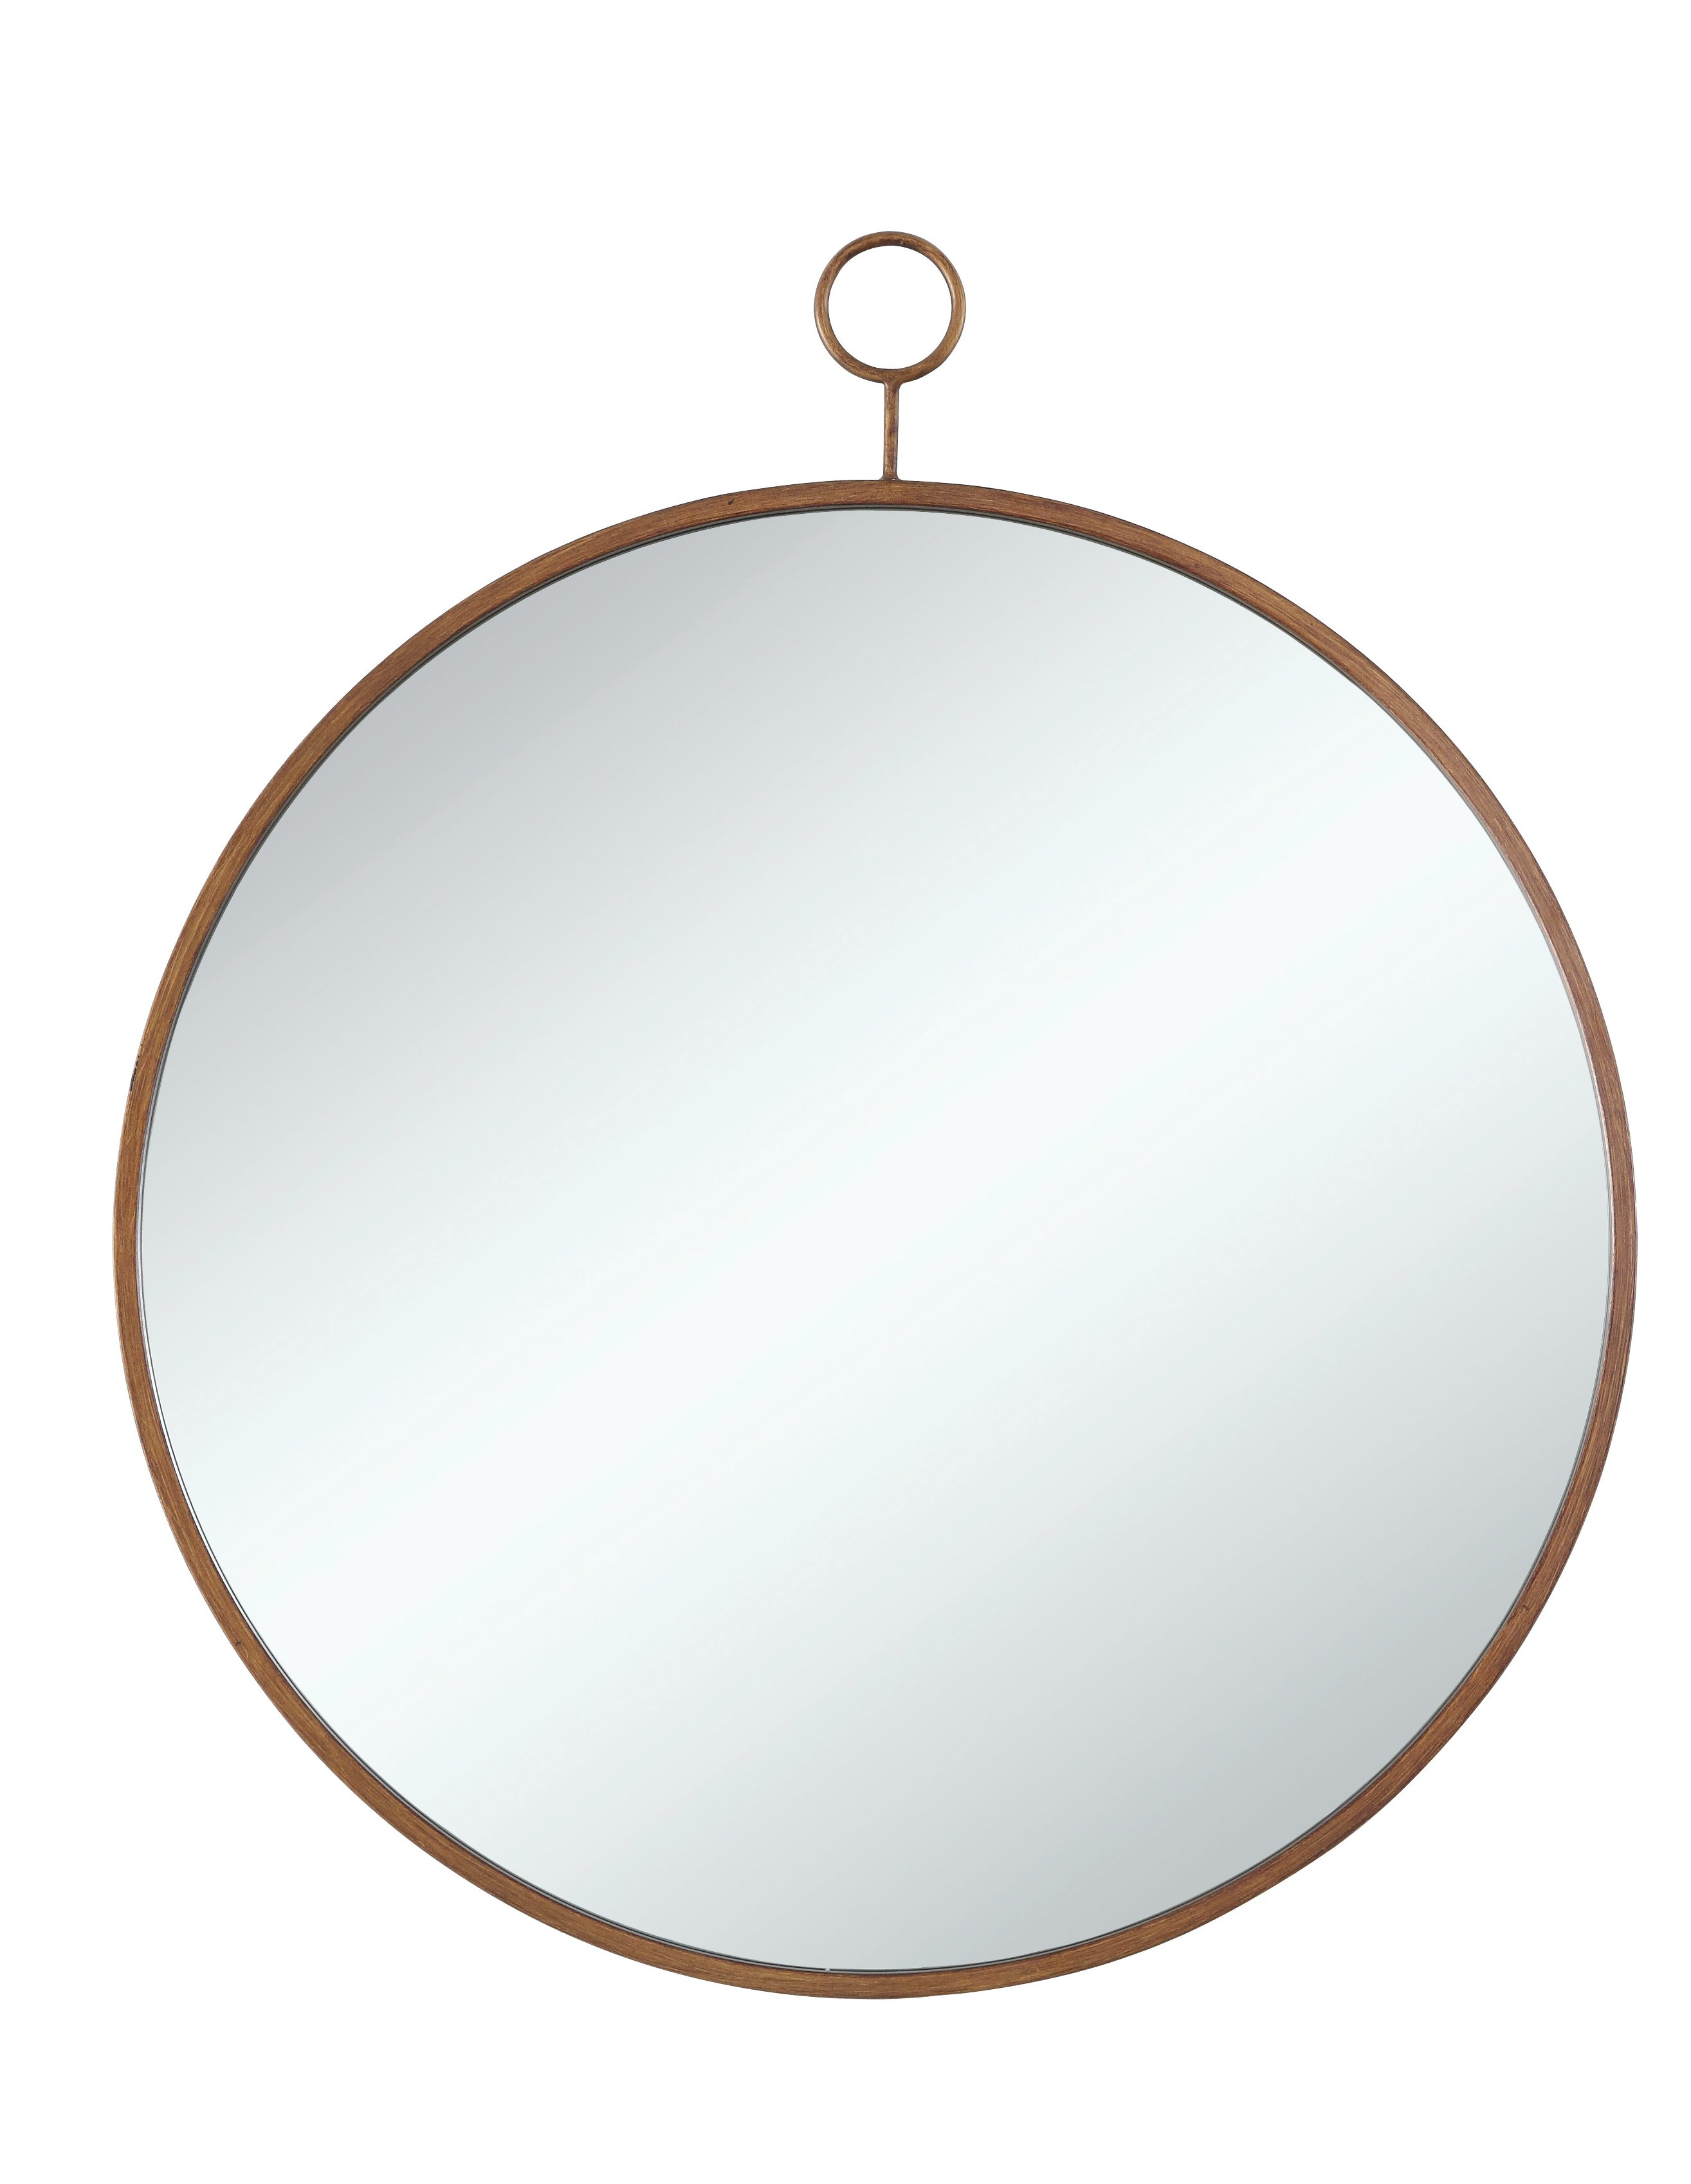 Modern Gold Wall Mirrors | Allmodern Regarding Tanner Accent Mirrors (View 13 of 20)